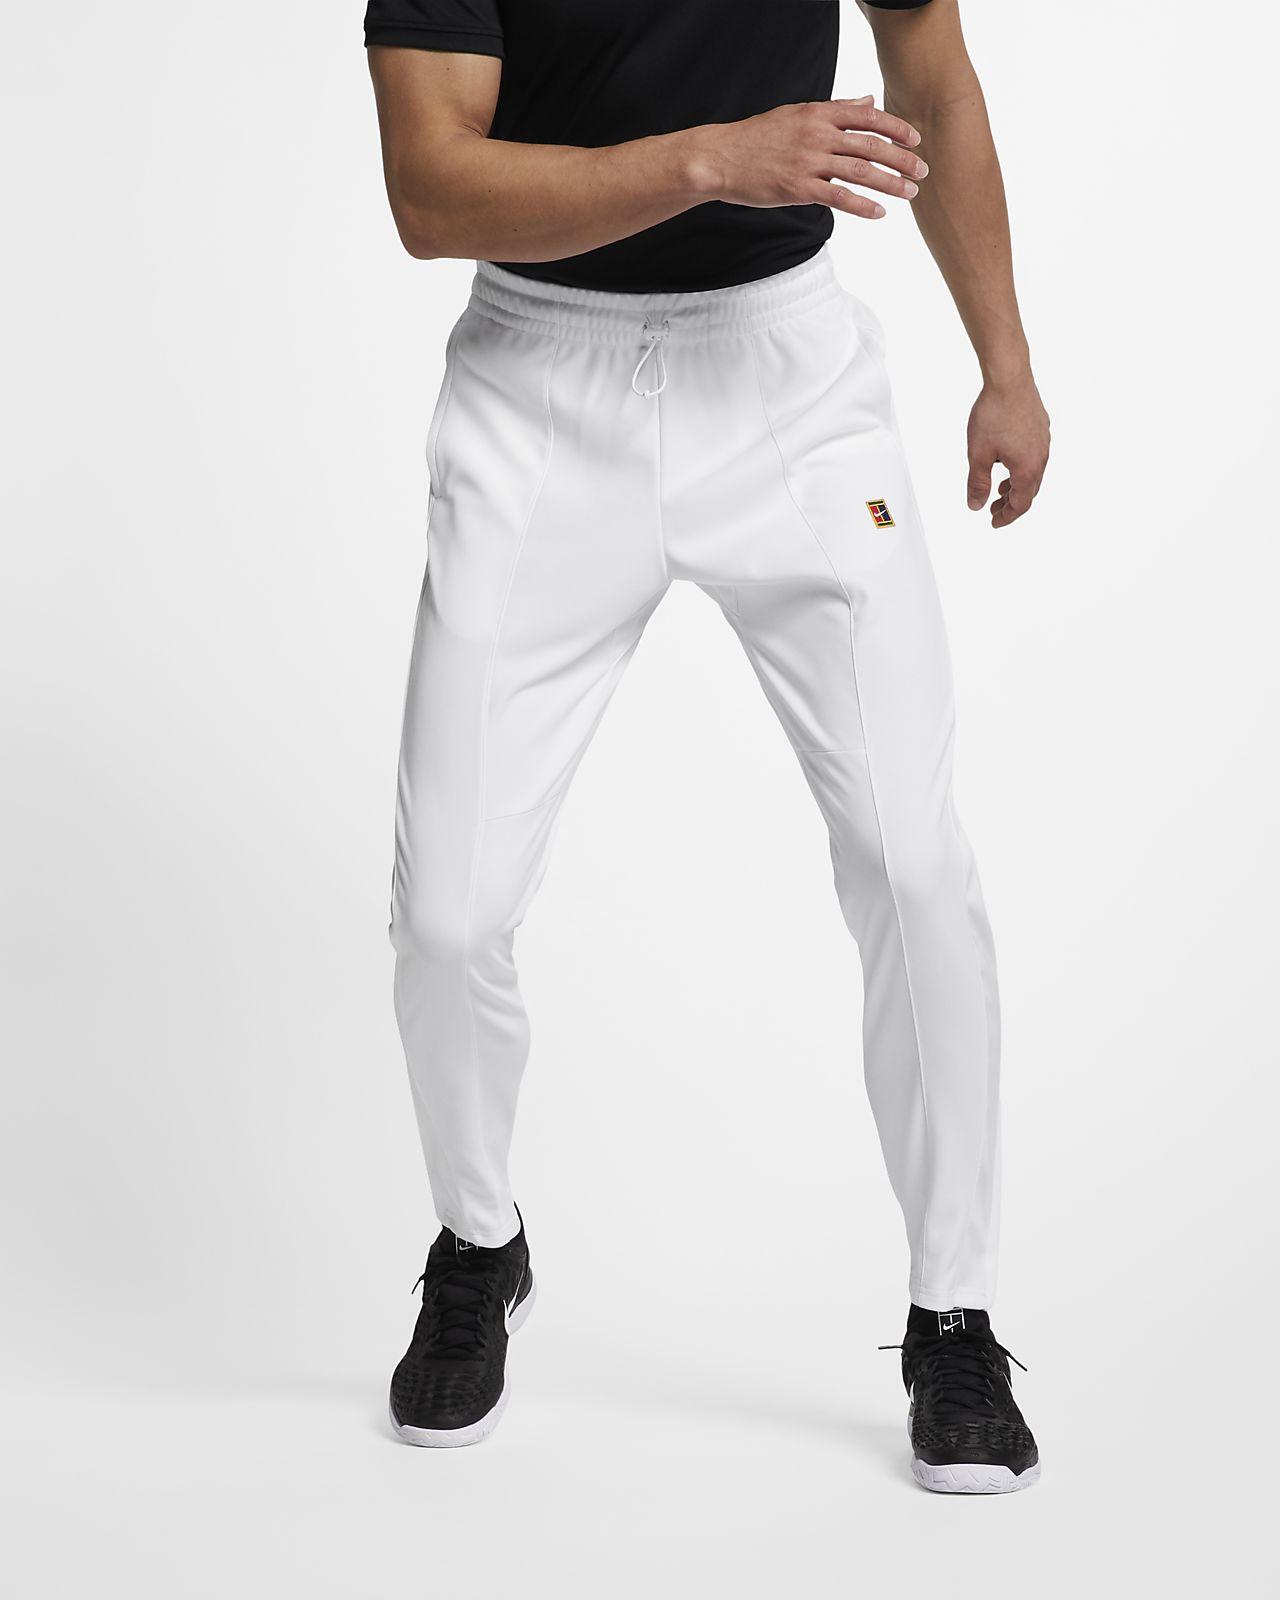 NikeCourt-tennisbukser til mænd